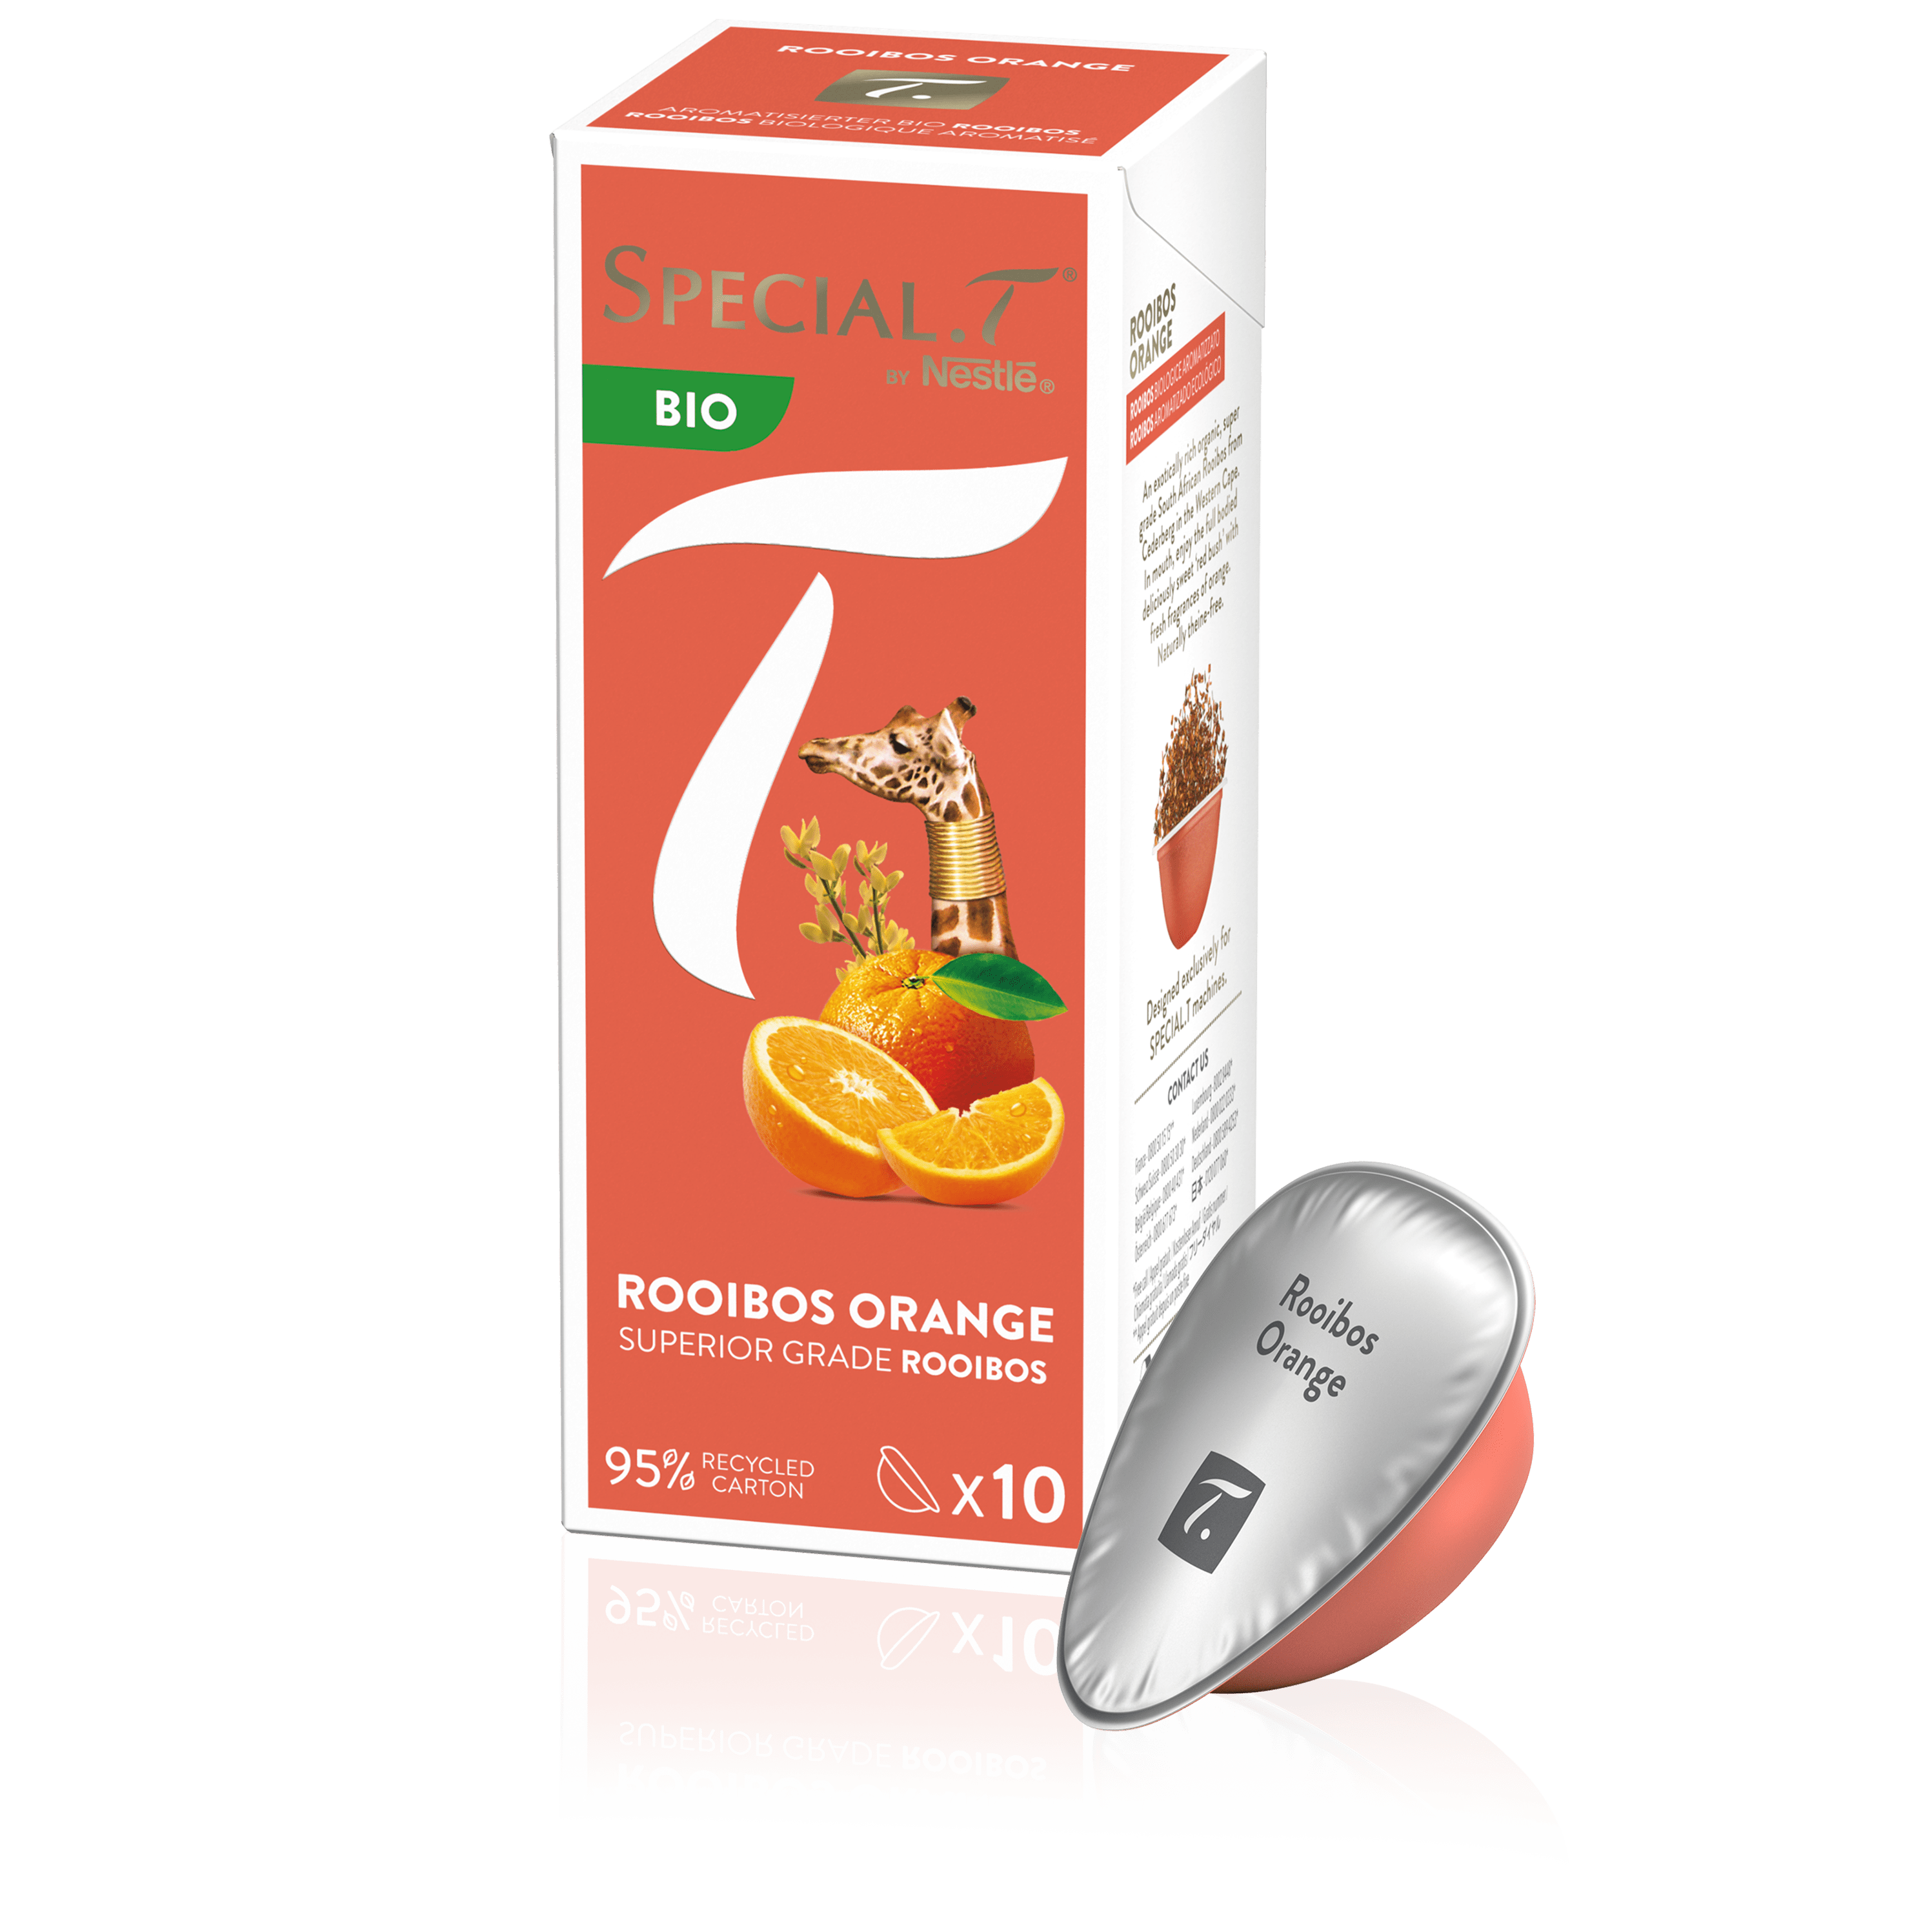 Capsule Rooibos Orange bio - Special.T - Kusmi Tea